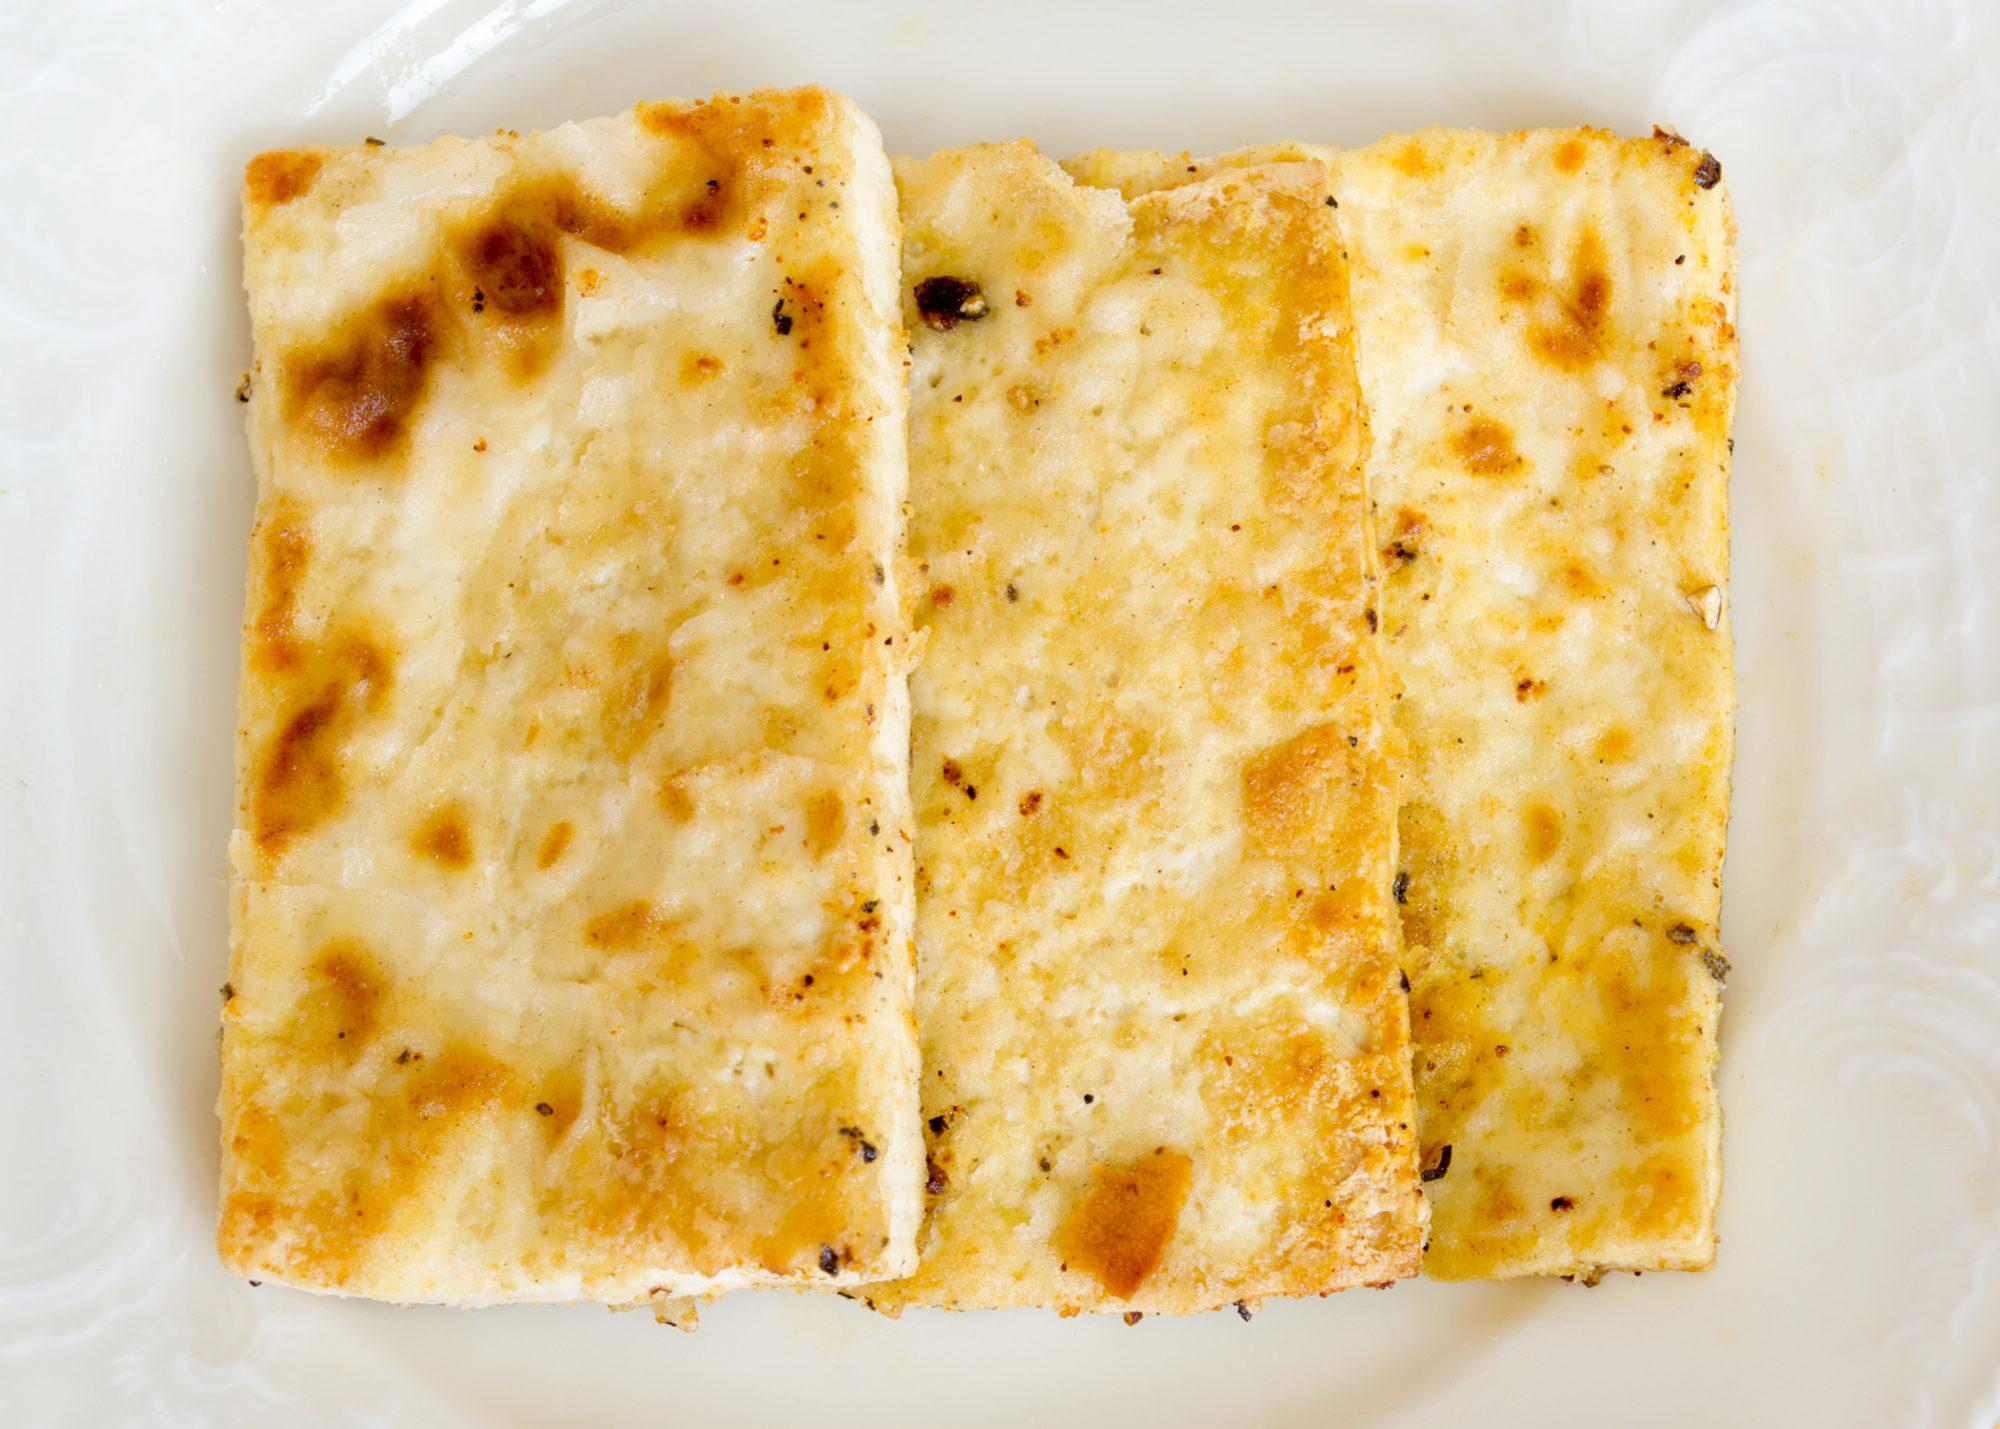 The Best Way to Pan-Fry Tofu